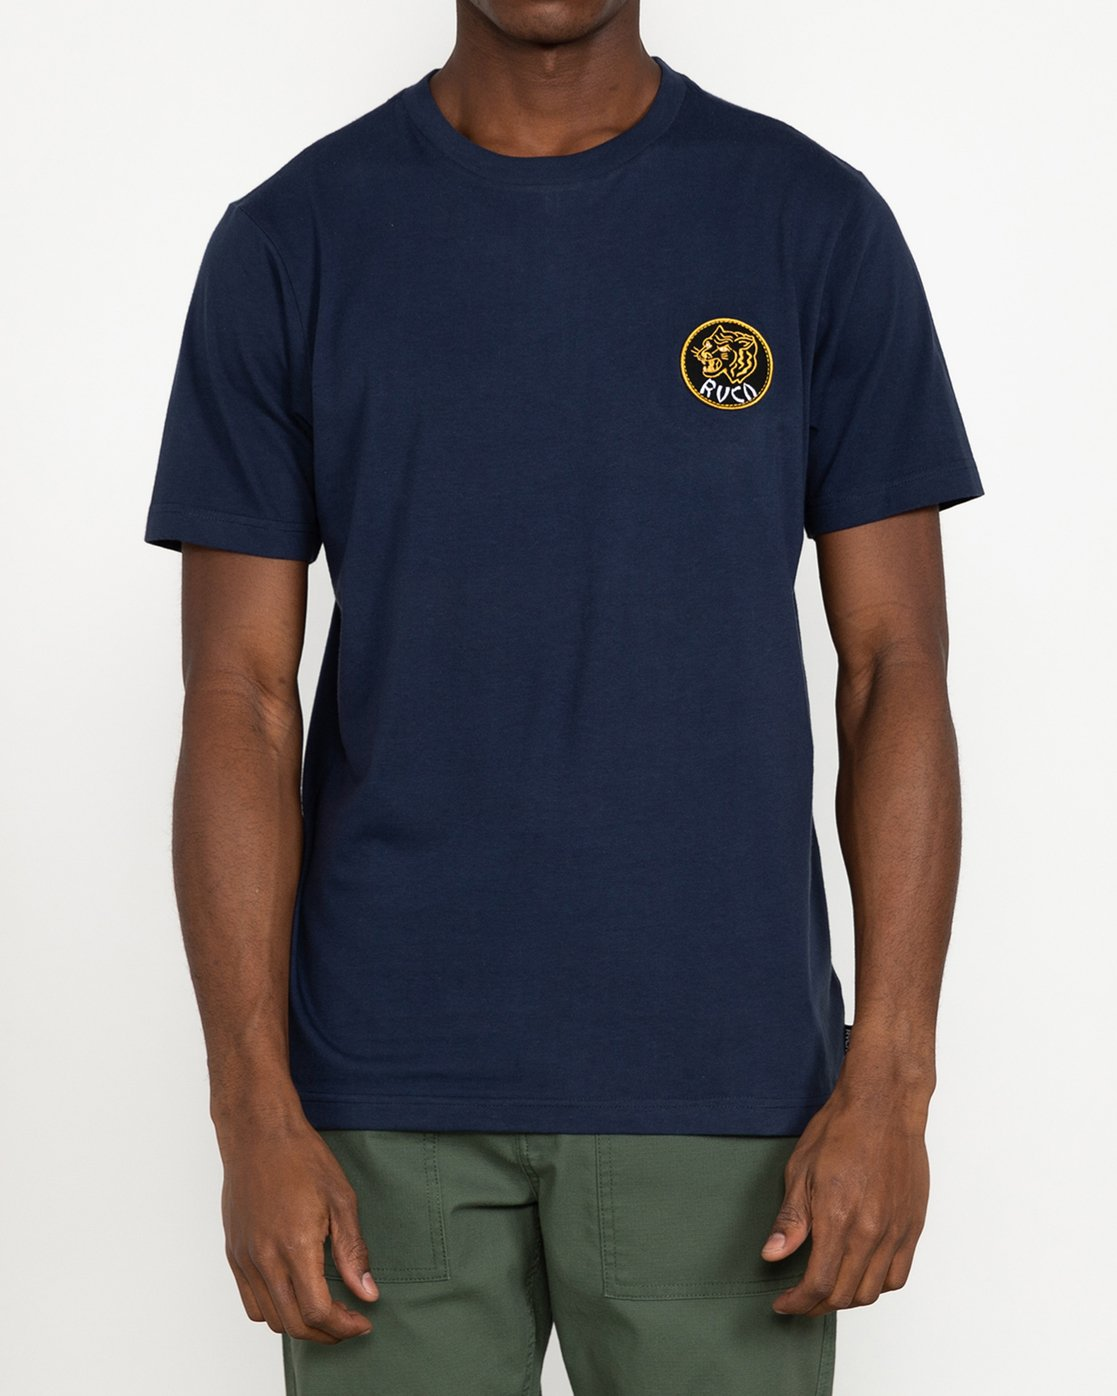 2 Dynasty - T-shirt pour Homme  U1SSSCRVF0 RVCA